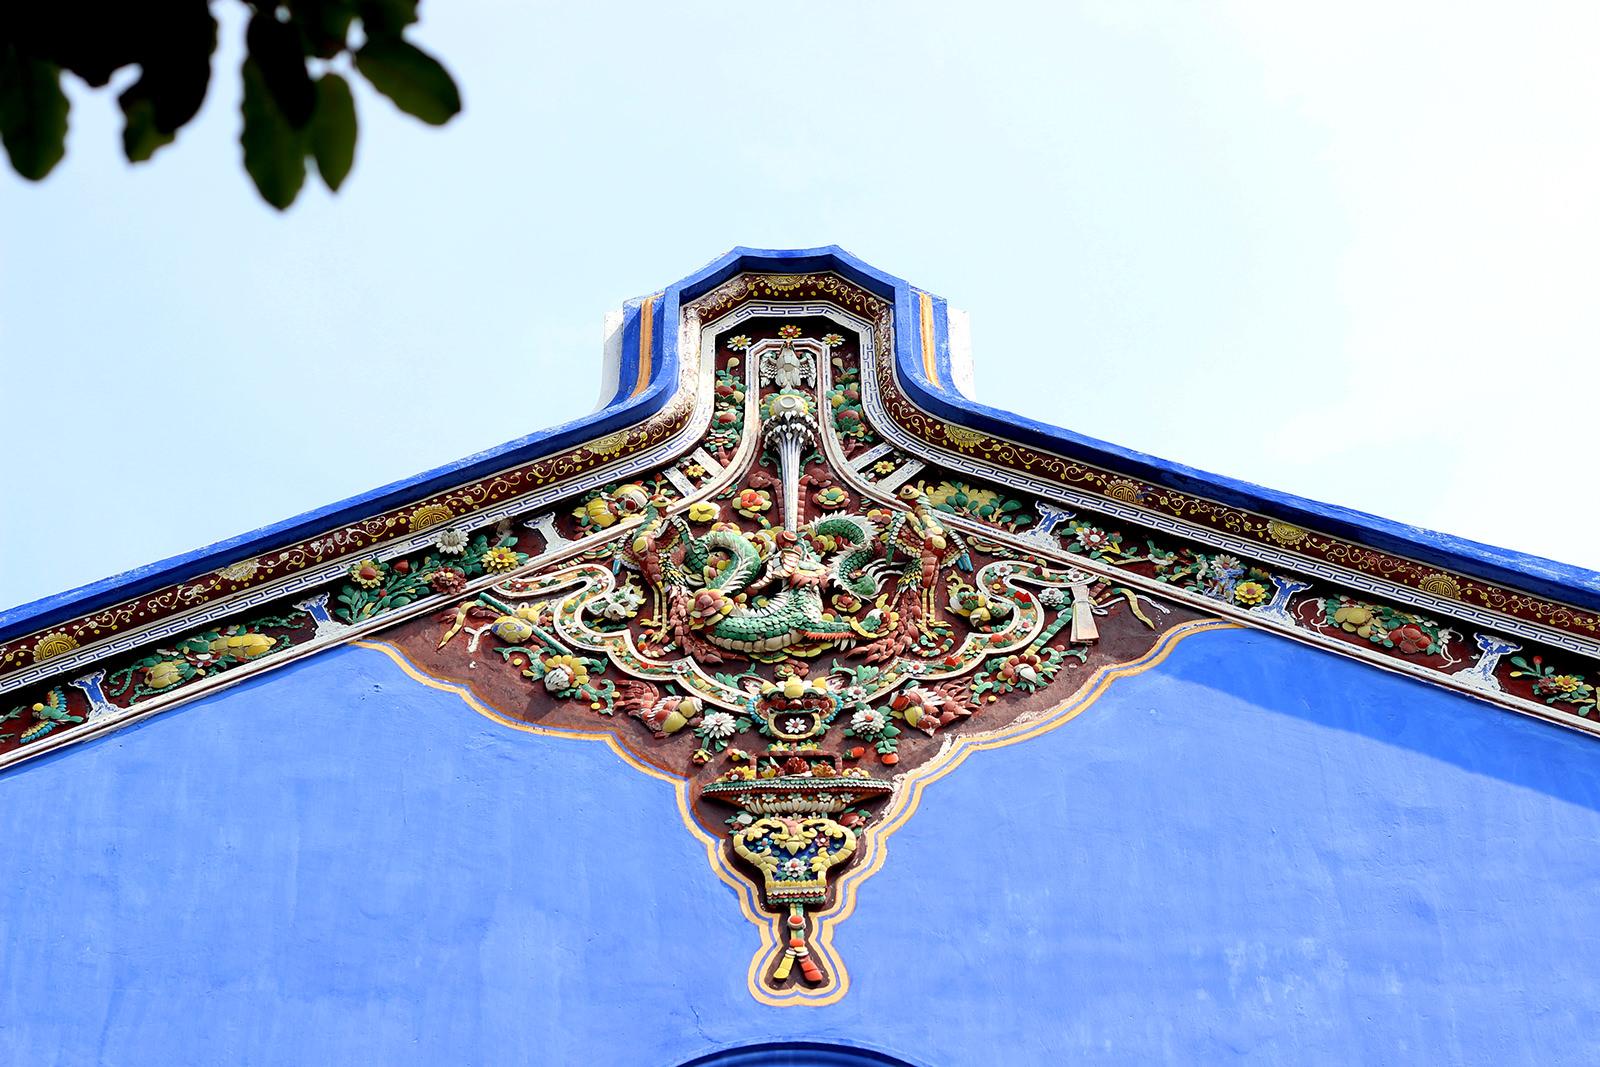 boutique-hotel-penang-island-blue-mansion-architecture-08 Architecture